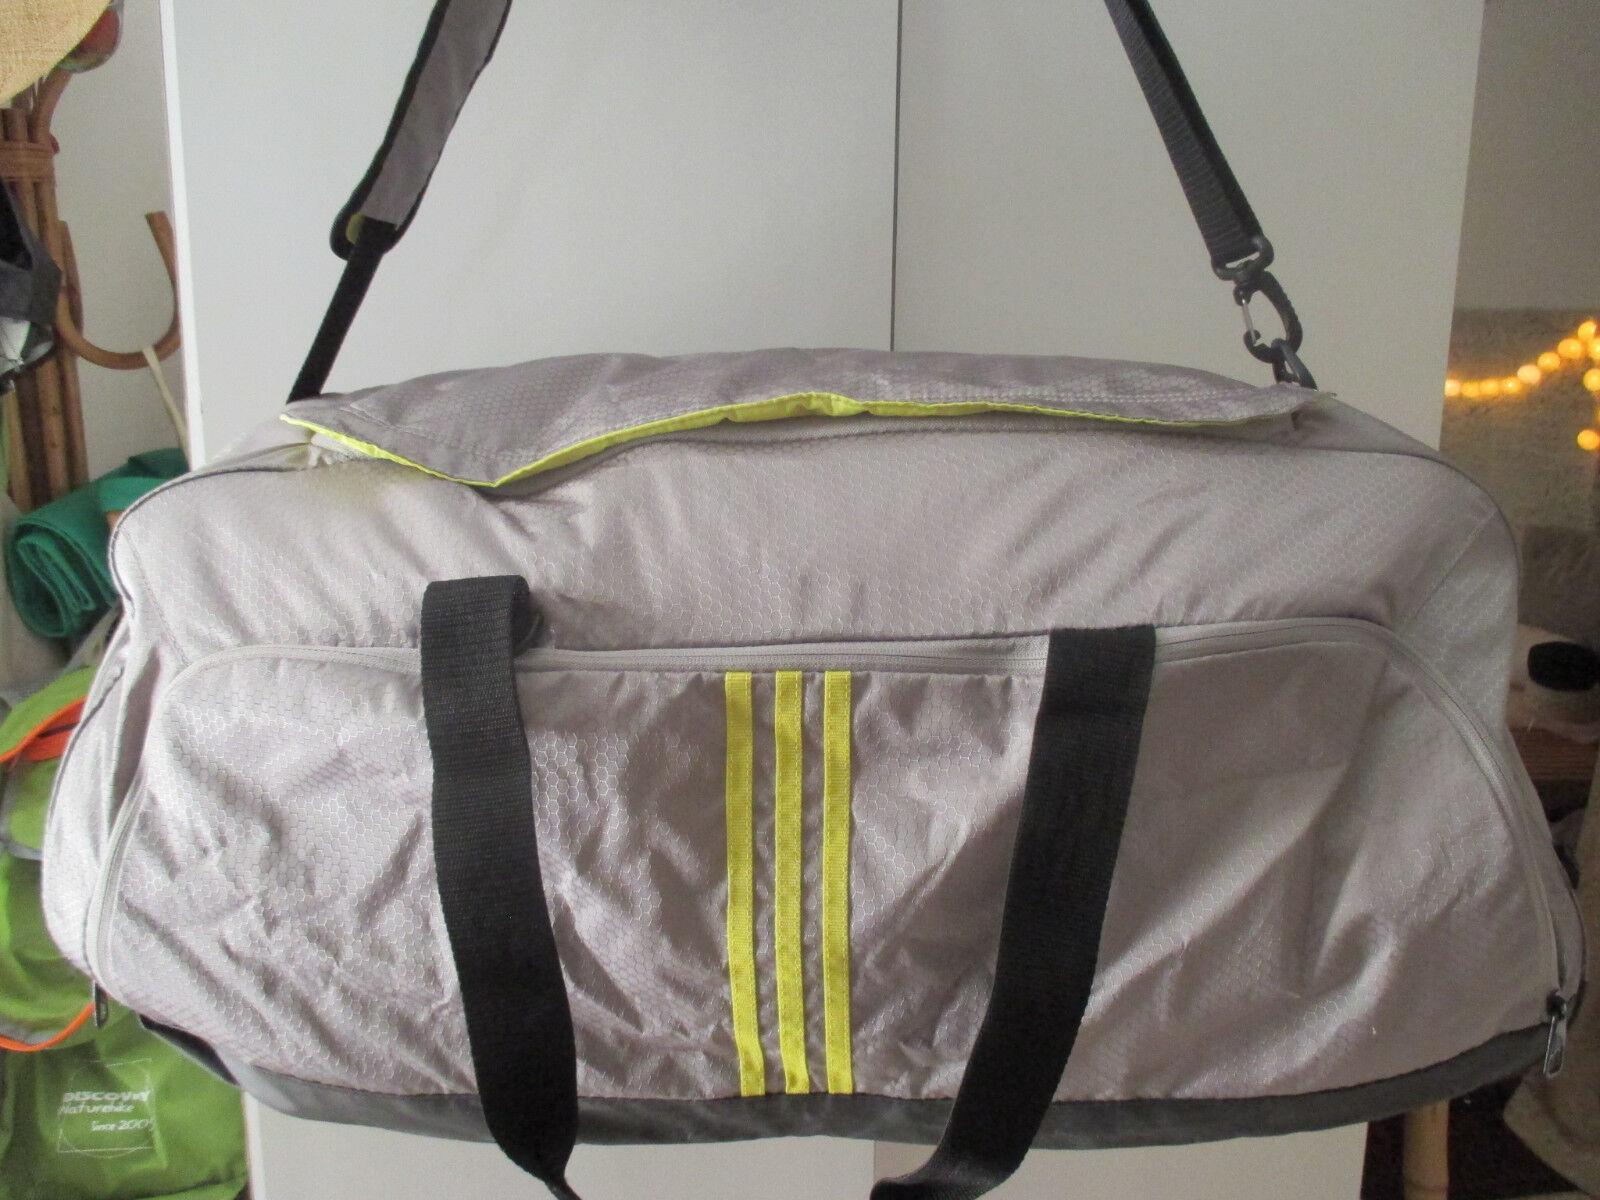 Adidas Gym Performance Team bag L large grey yellow duffle 65x31x25 cm 3 stripe